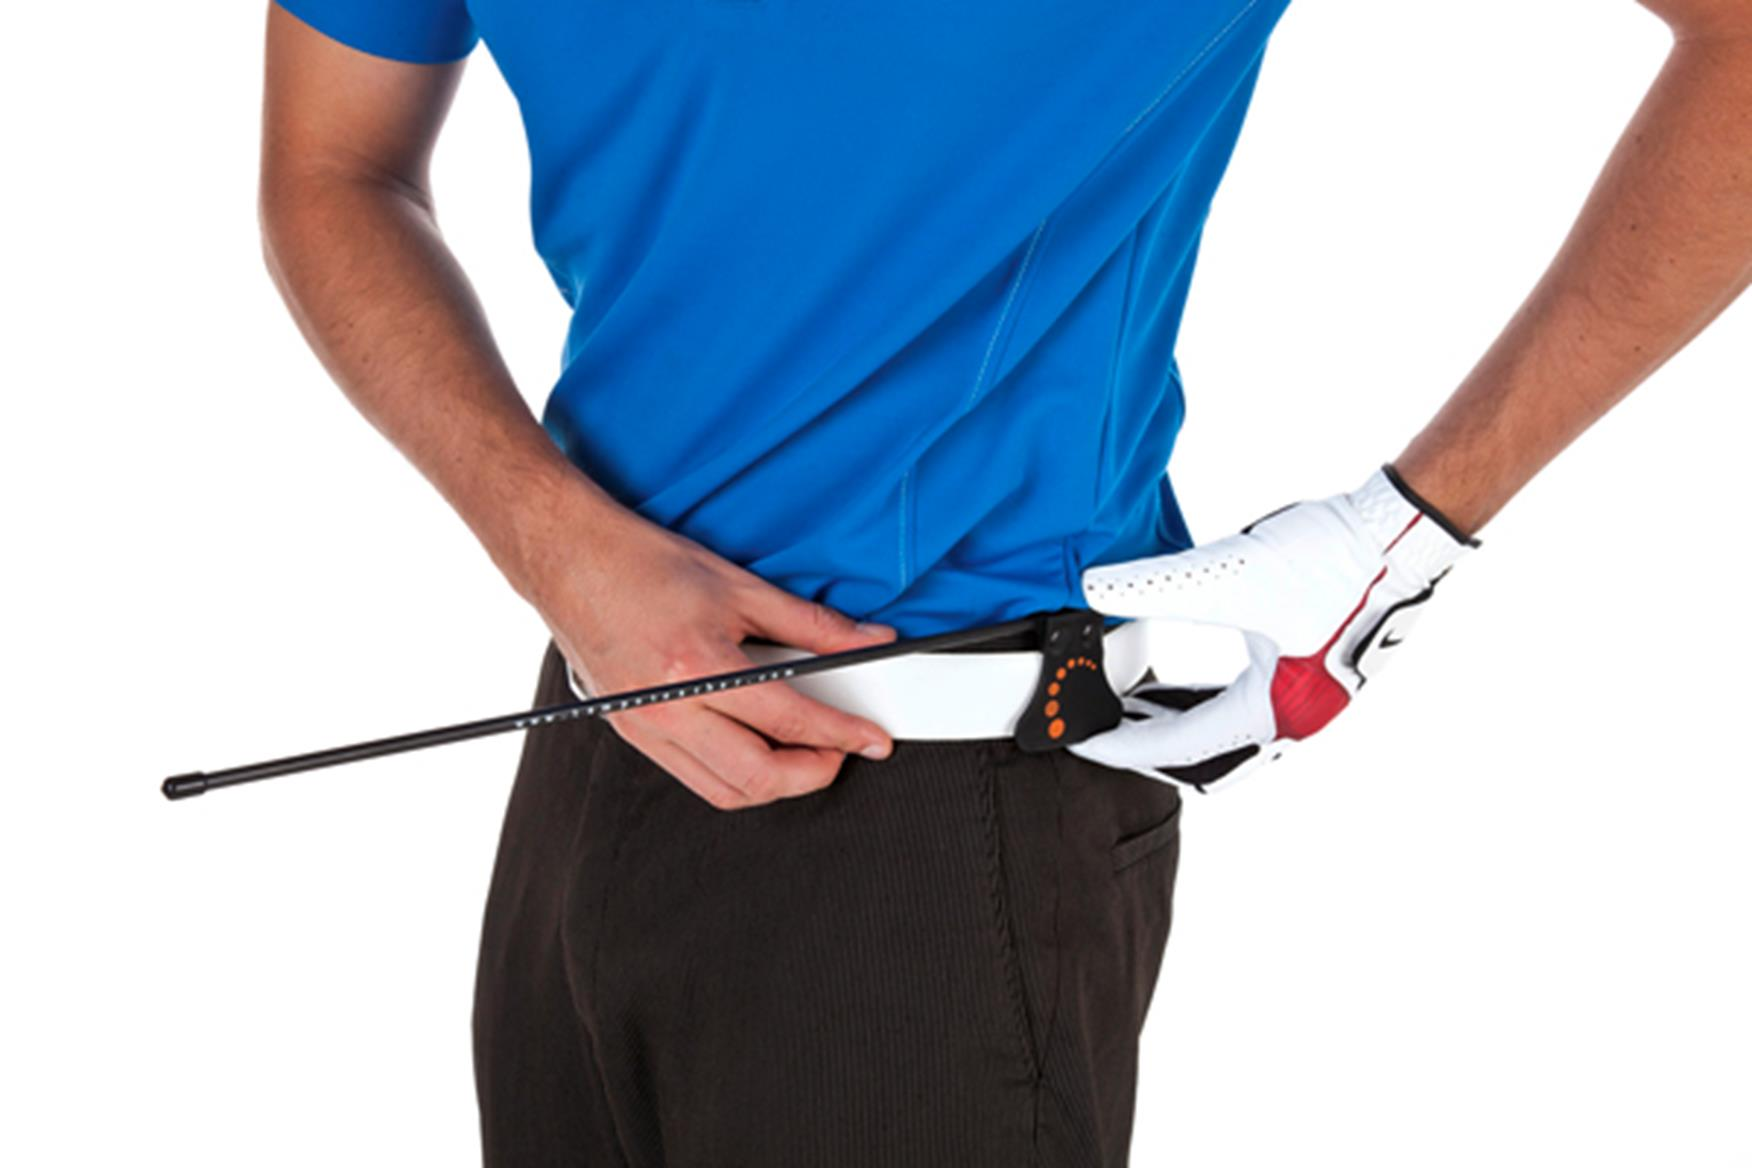 gaopingolf swing golf aid grip aids tools training trainer